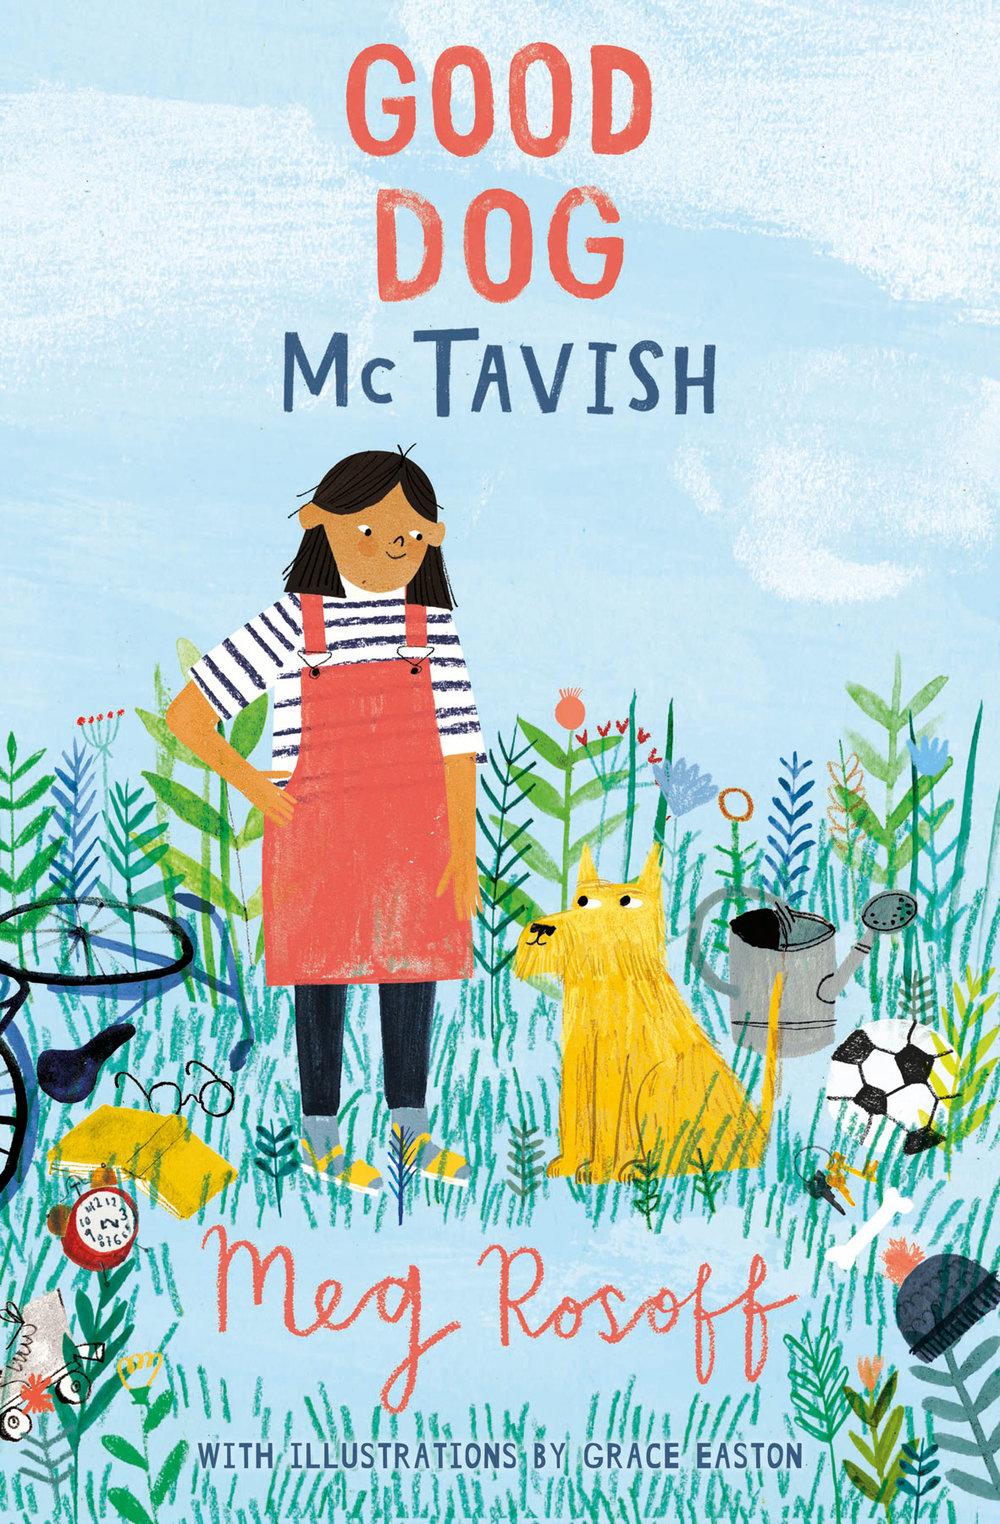 Good-Dog-McTavish-front-cover-large-web.jpg